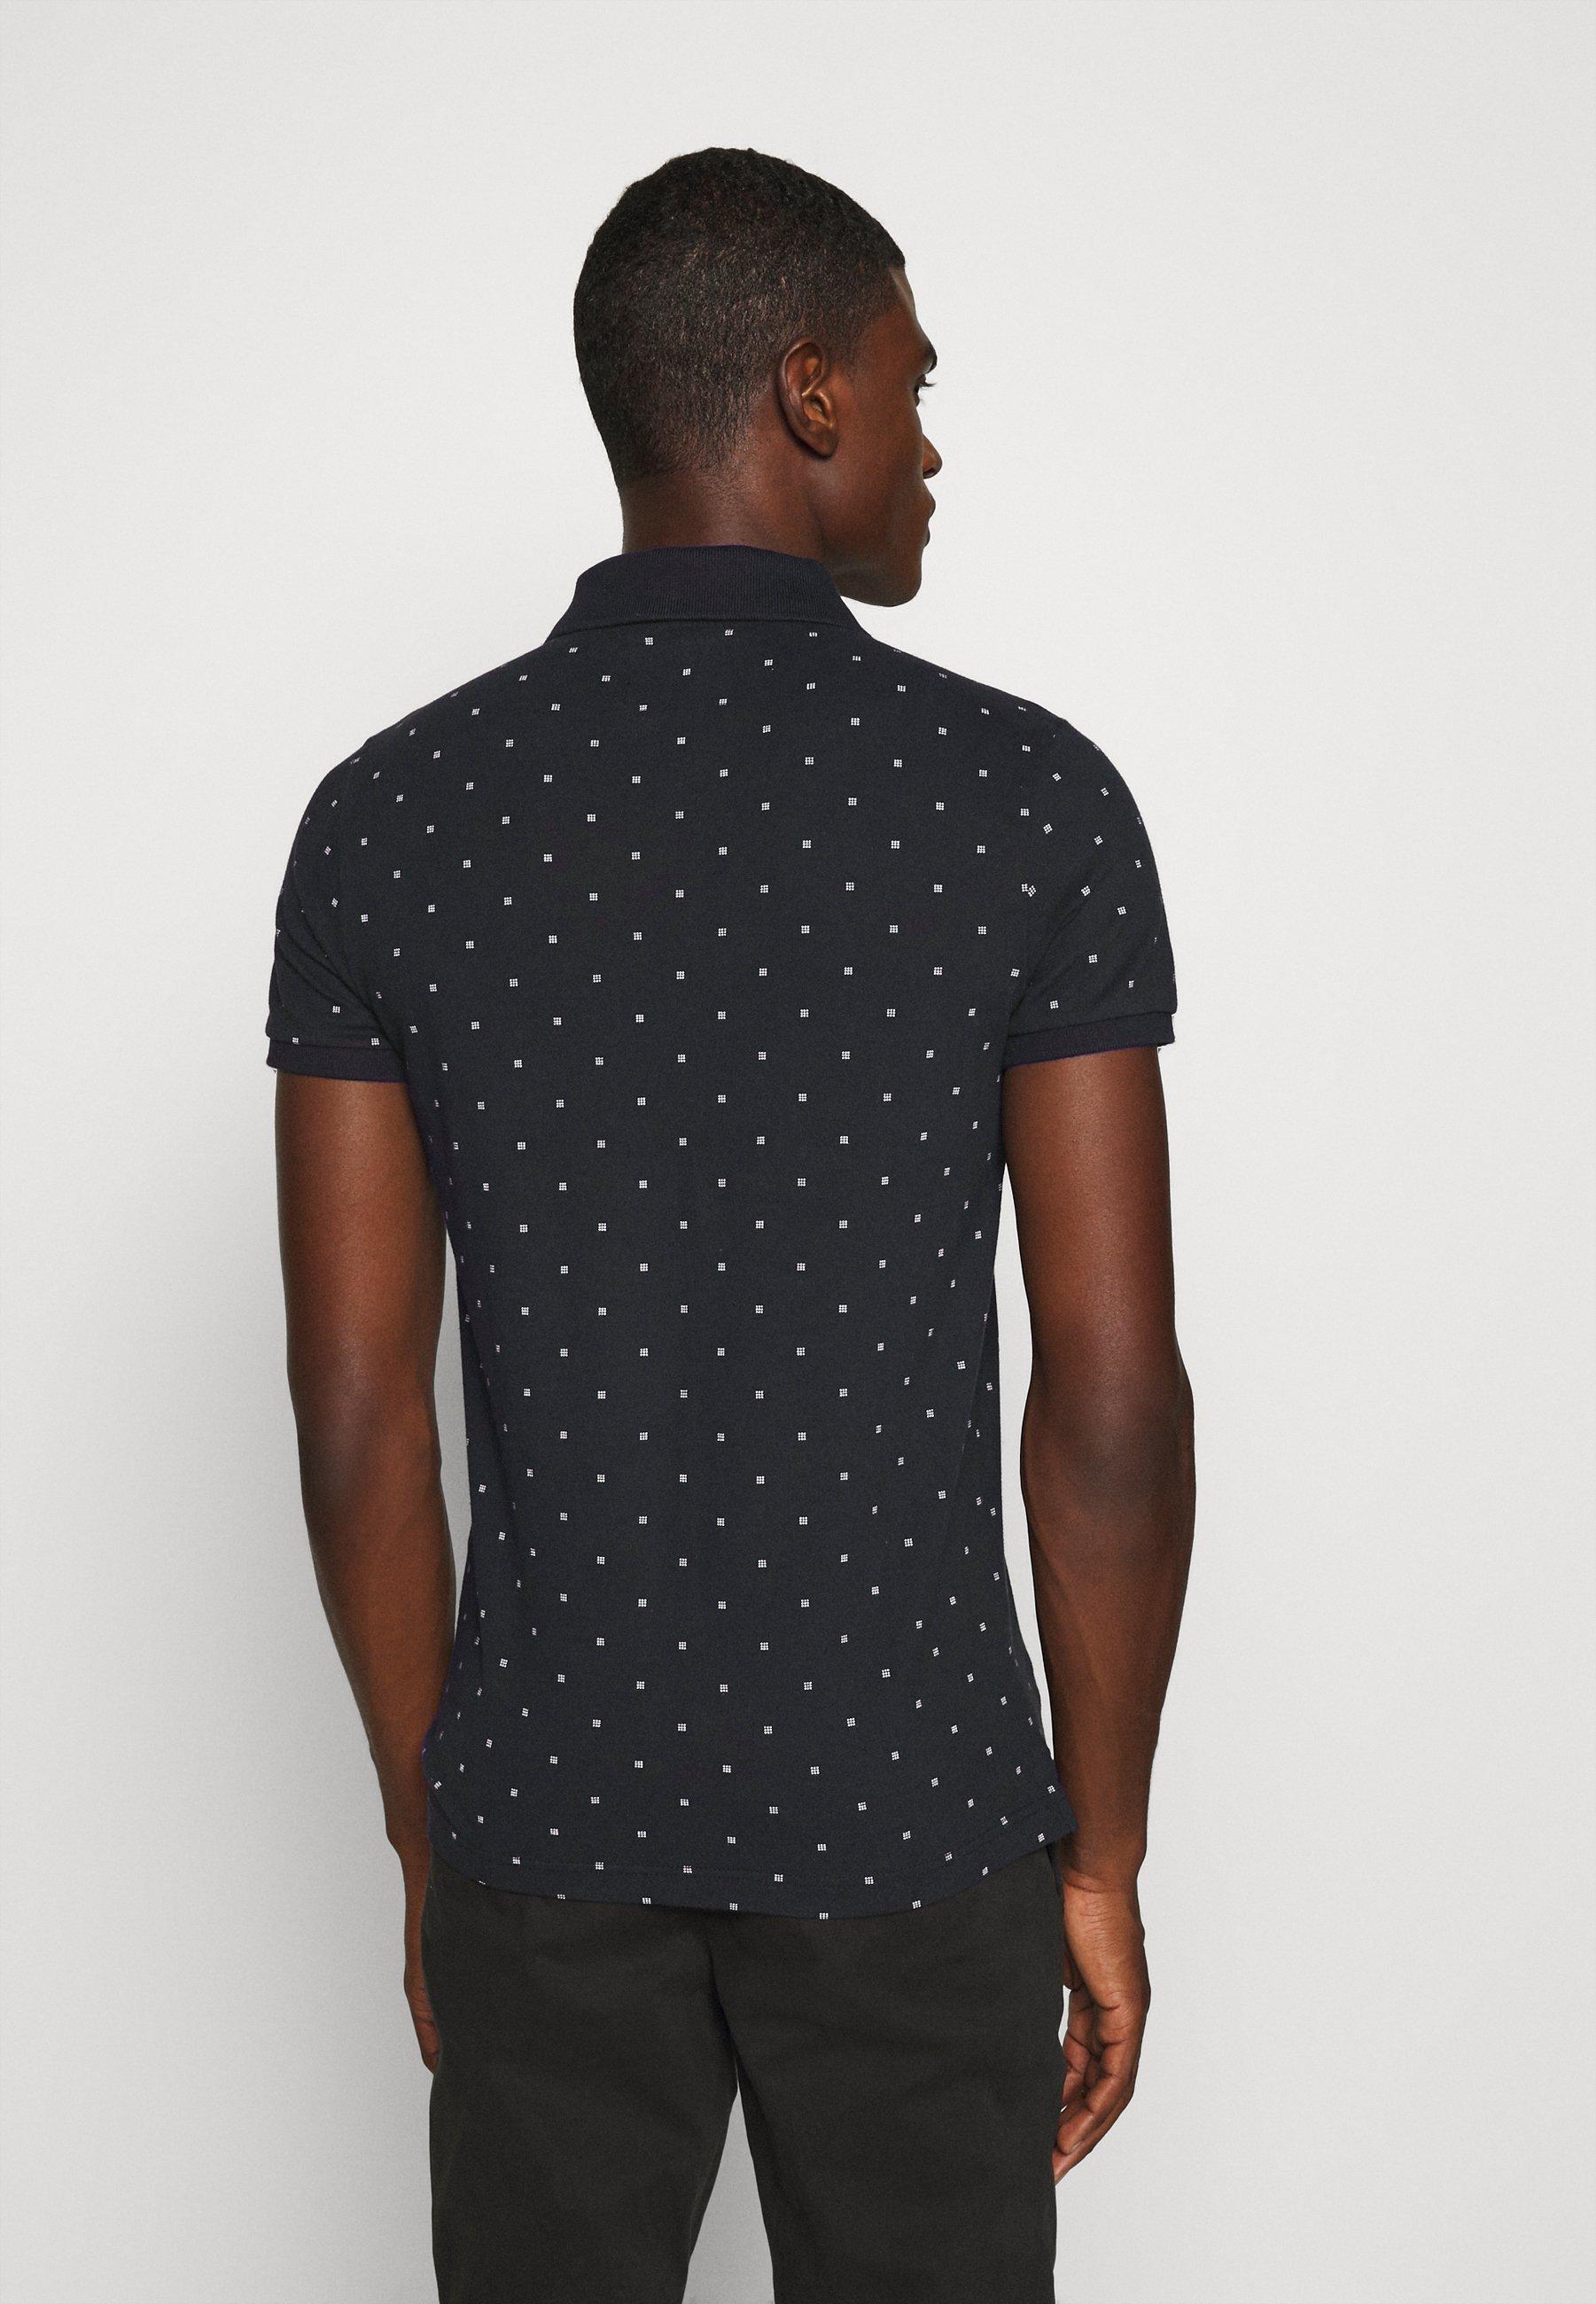 Hollister Co. Polo shirt - black sVIMe